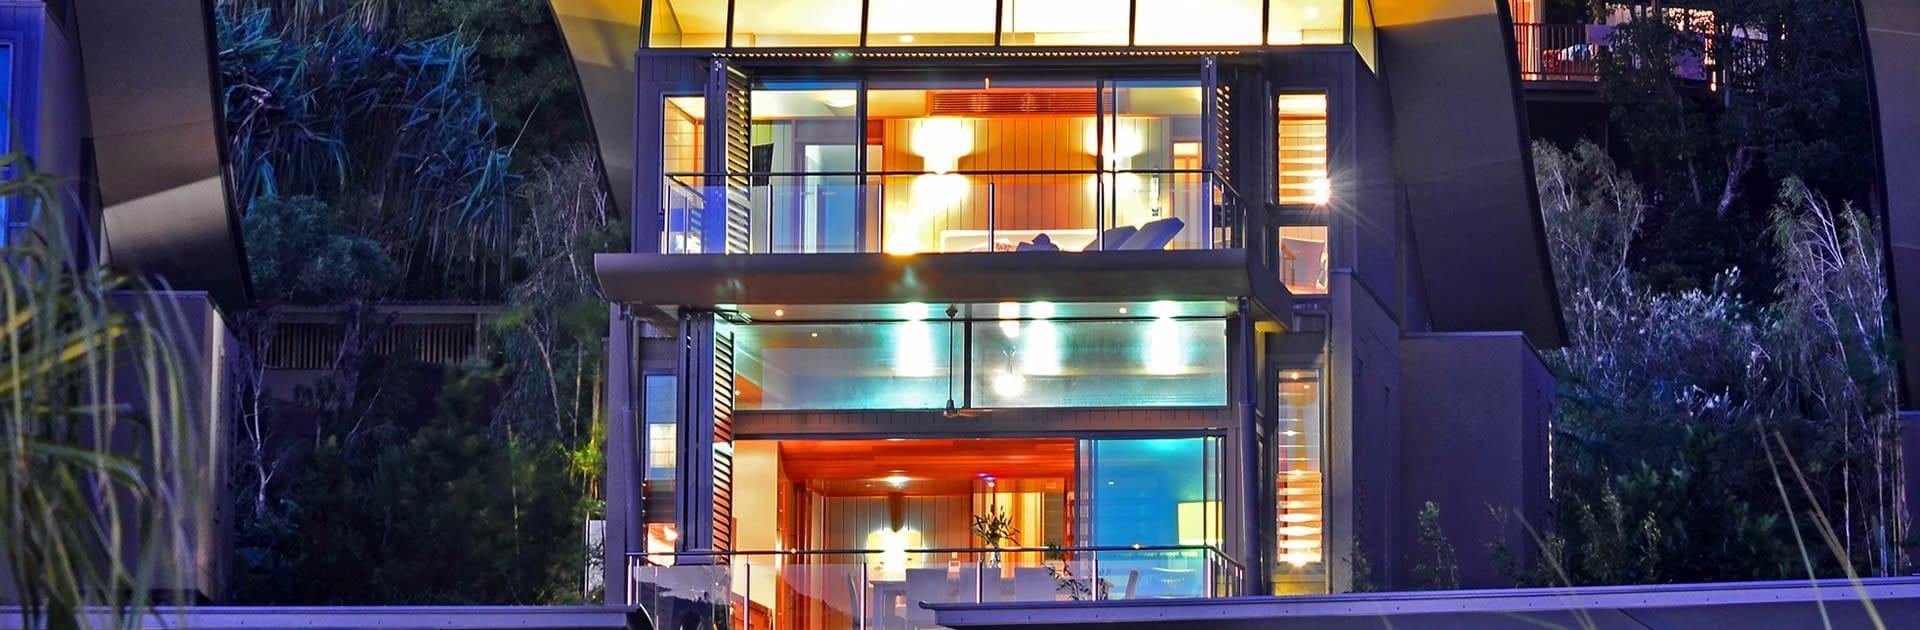 surveying-hamilton-island-yacht-club-villa-slide